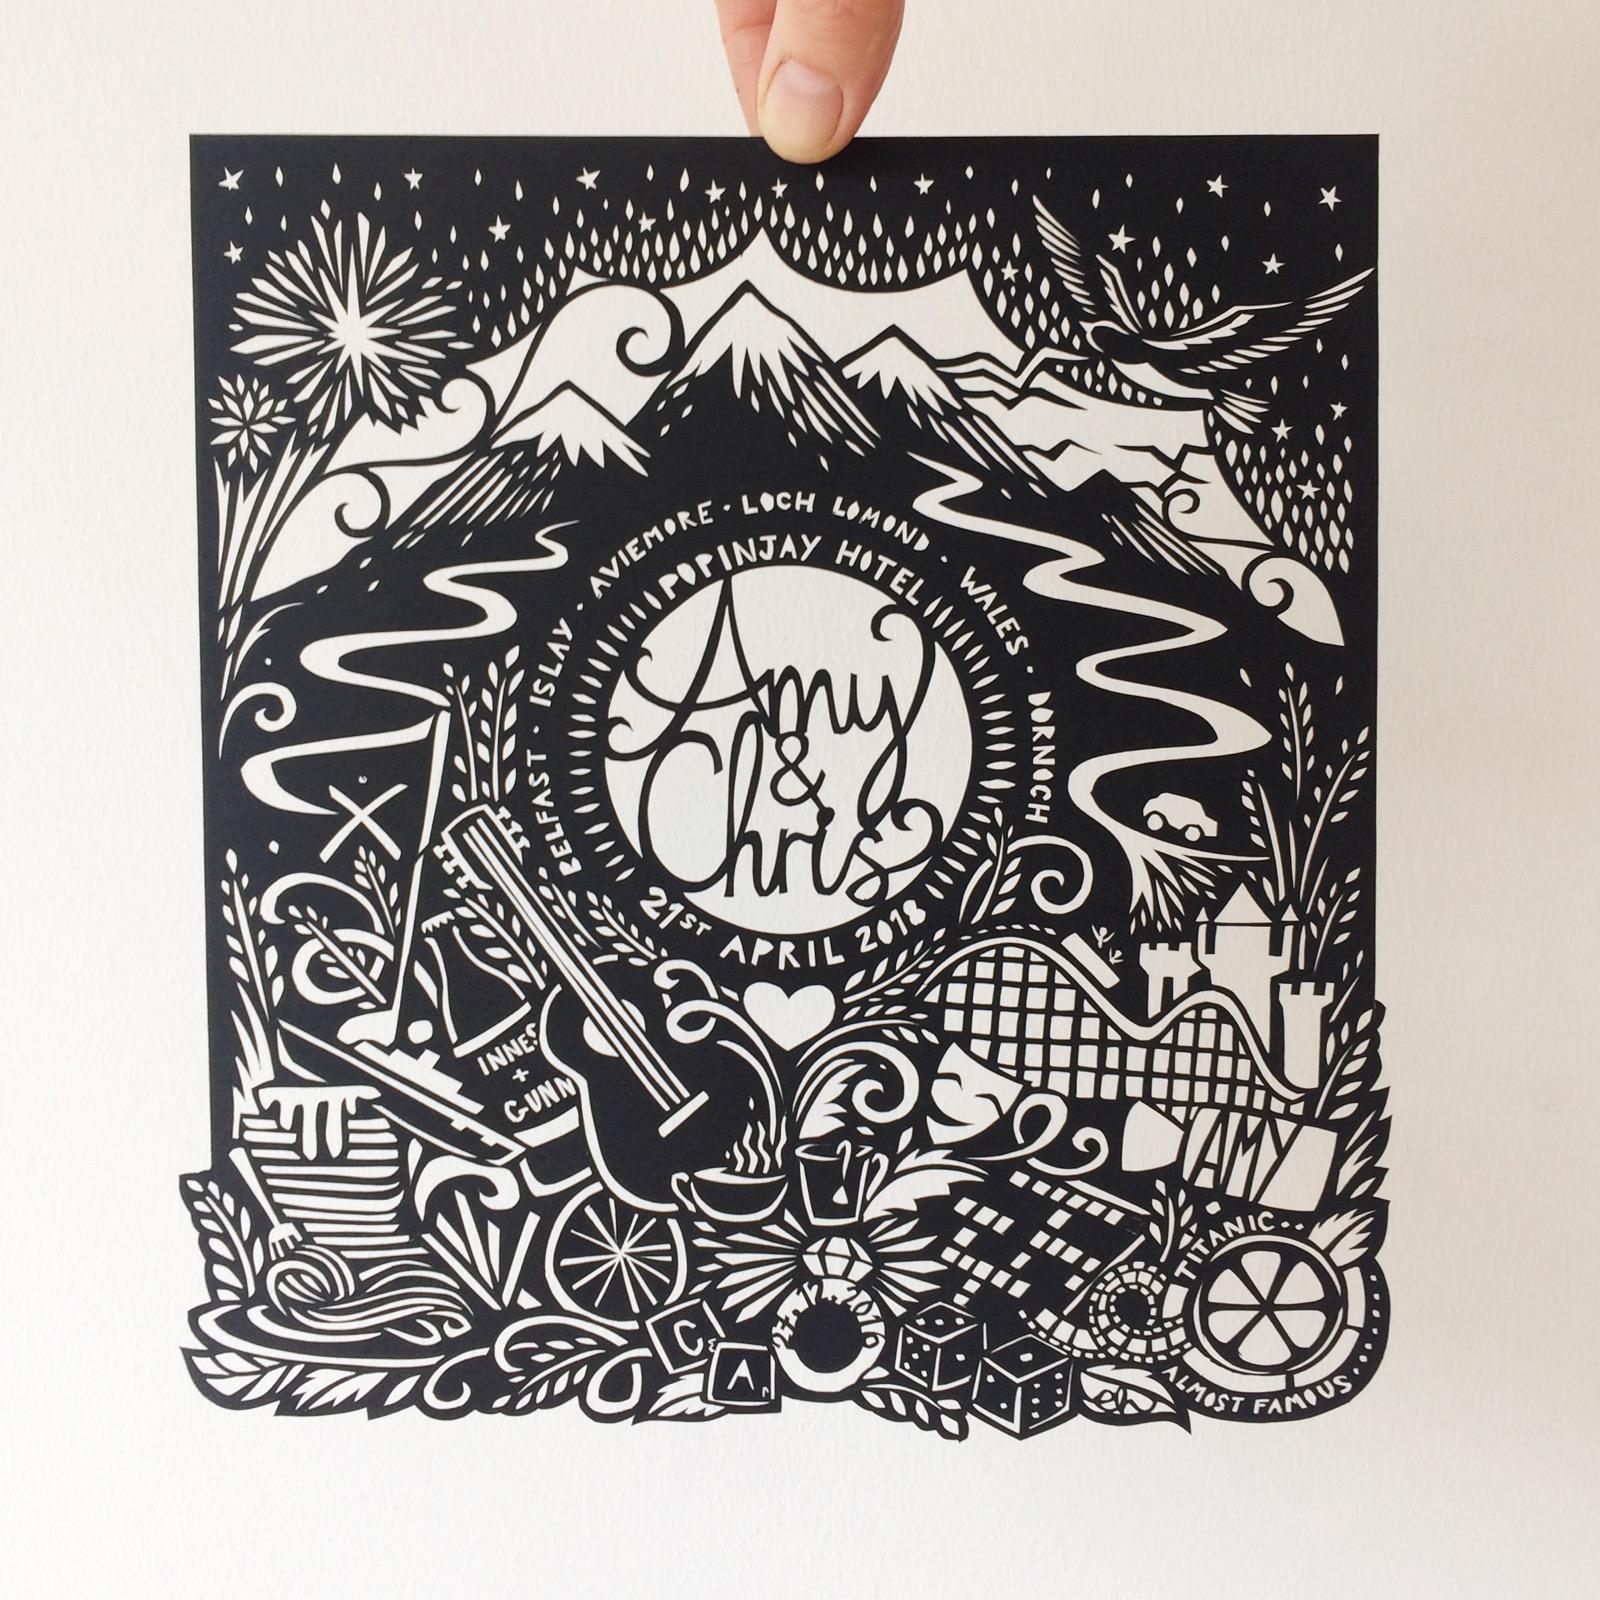 IMG_0125 2.JPG